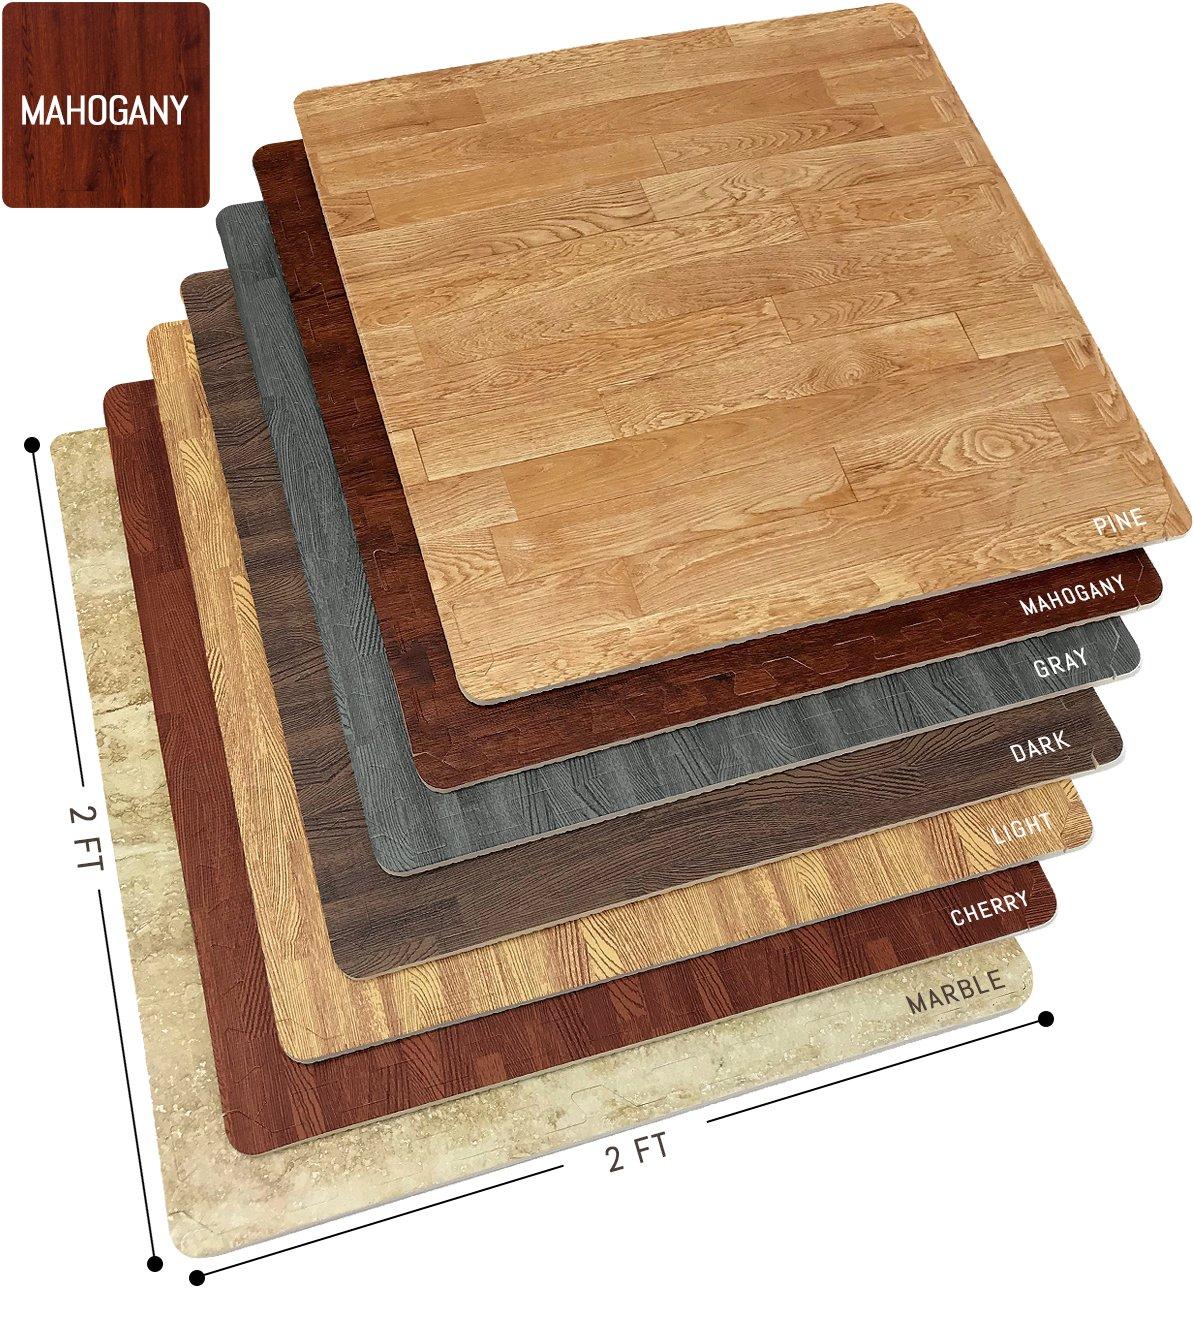 Sorbus Wood Grain Floor Mats Foam Interlocking Mats Tile 3/8-Inch Thick Flooring Wood Mat Tiles Borders - Home Office Playroom Basement Trade Show (12 Tiles, 48 Sq ft, Mahogany) by Sorbus